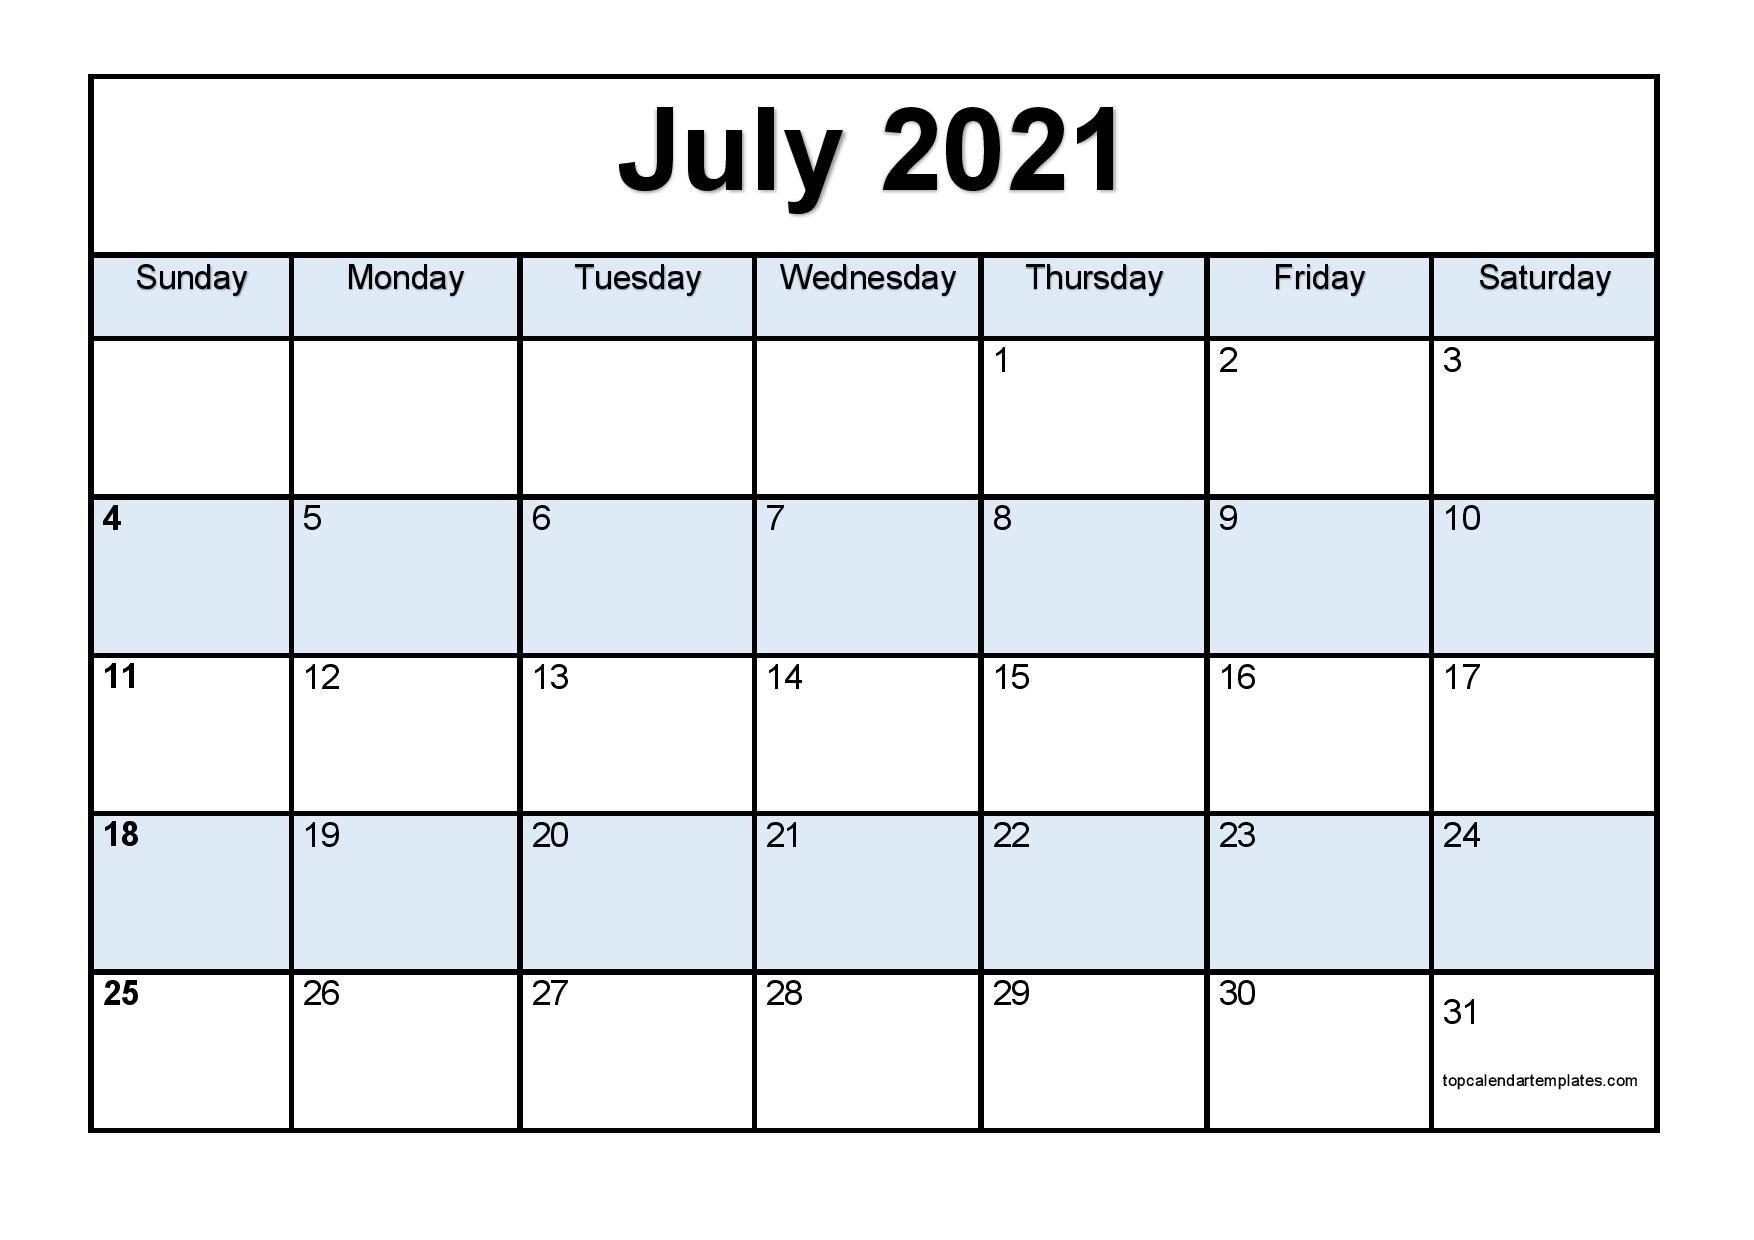 Printable July 2021 Calendar Template - Pdf, Word, Excel July 2021 Calendar Pdf Download